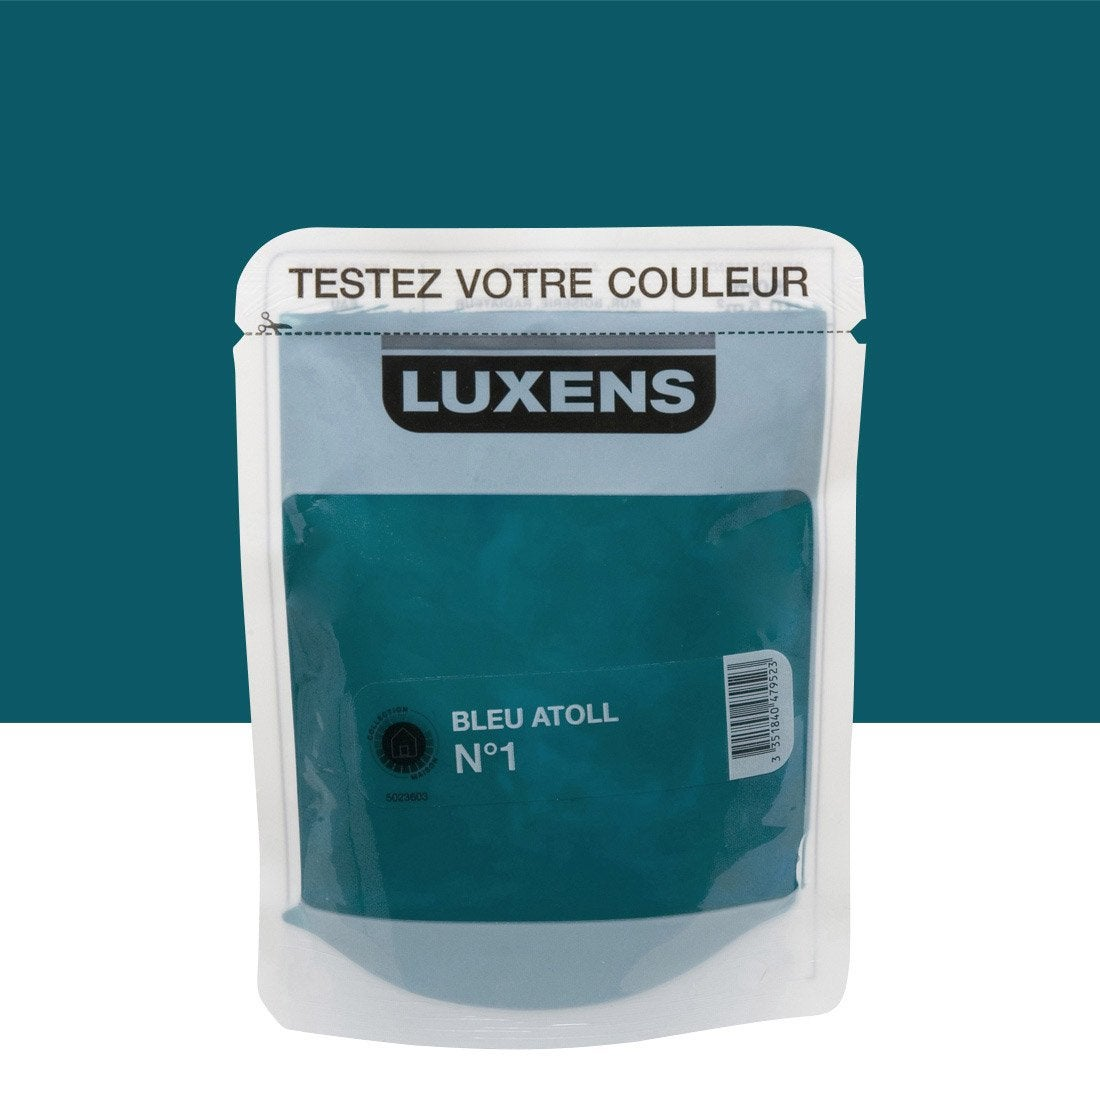 leroymerlin.fr/multimedia/b51400550817/produits/testeur-peinture-couleurs-interieures-satin-luxens-bleu-atoll-n-1-0-05-l.jpg